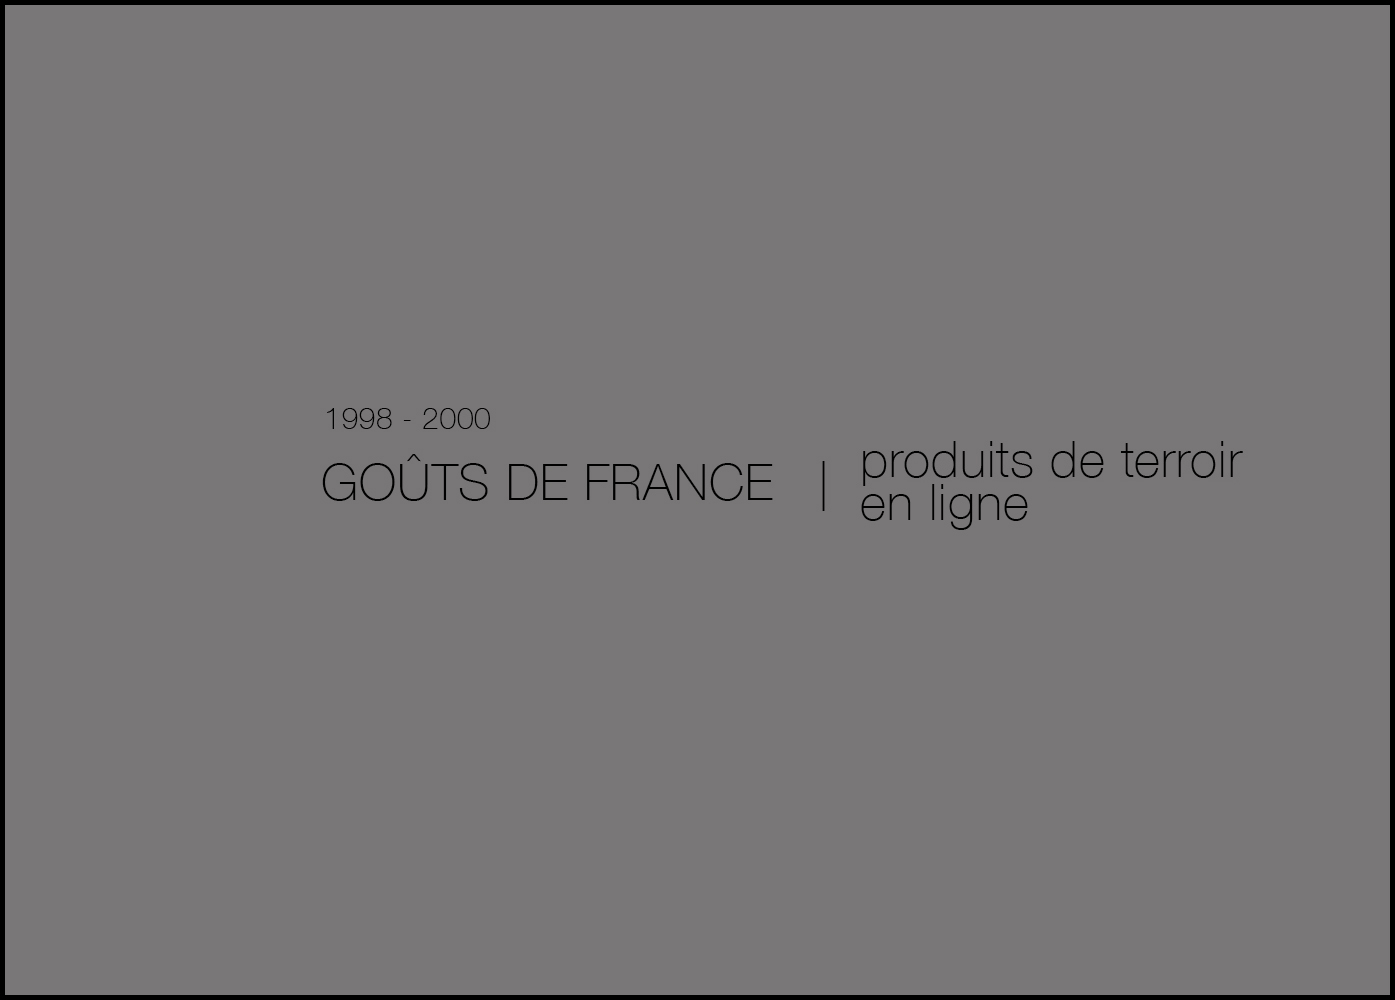 15_1998-2000-Gouts-de-France